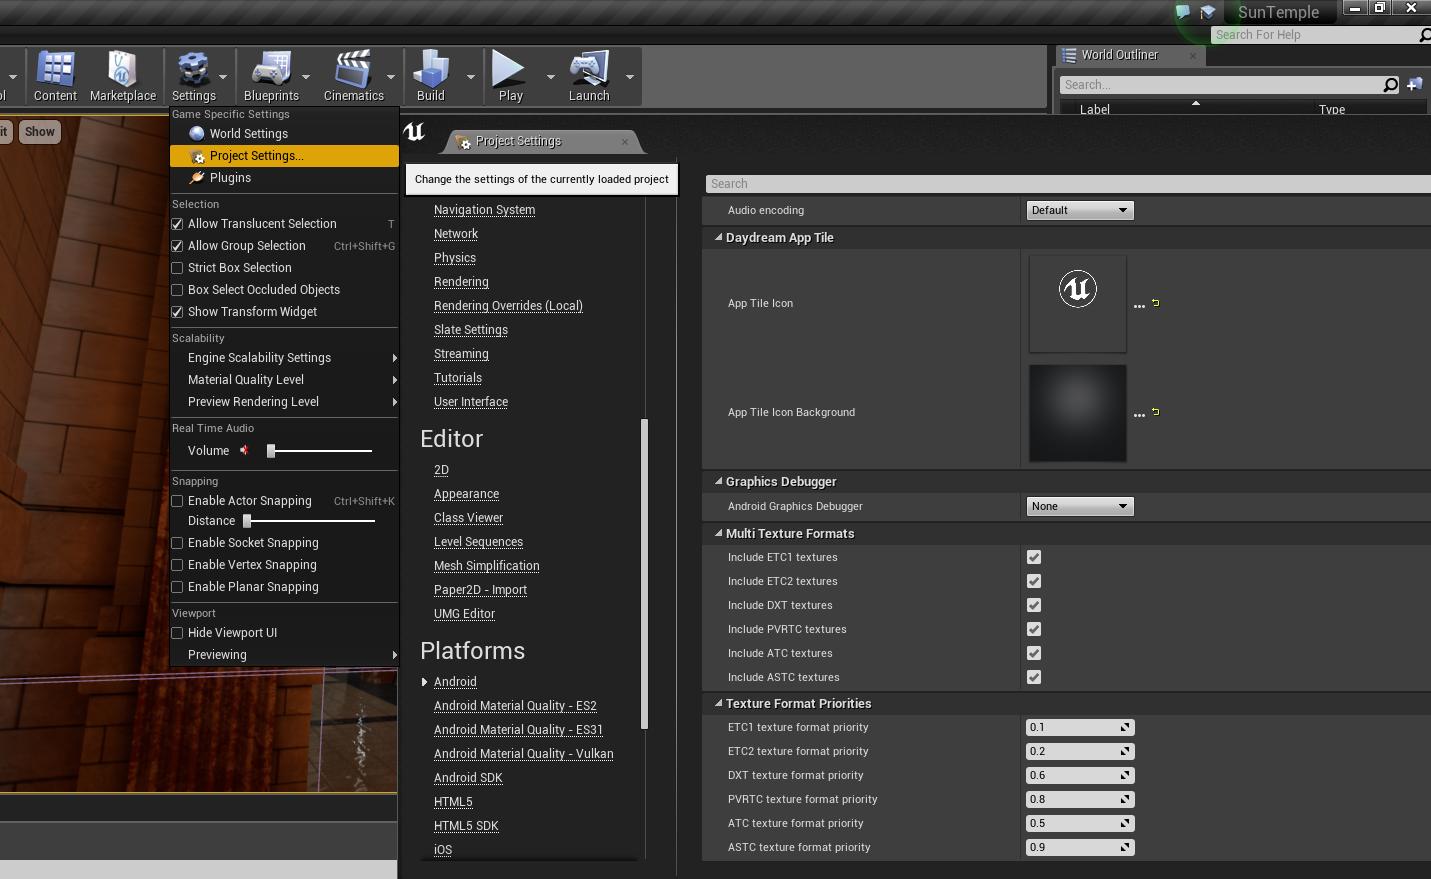 Building an Unreal Engine application with Mali Graphics Debugger